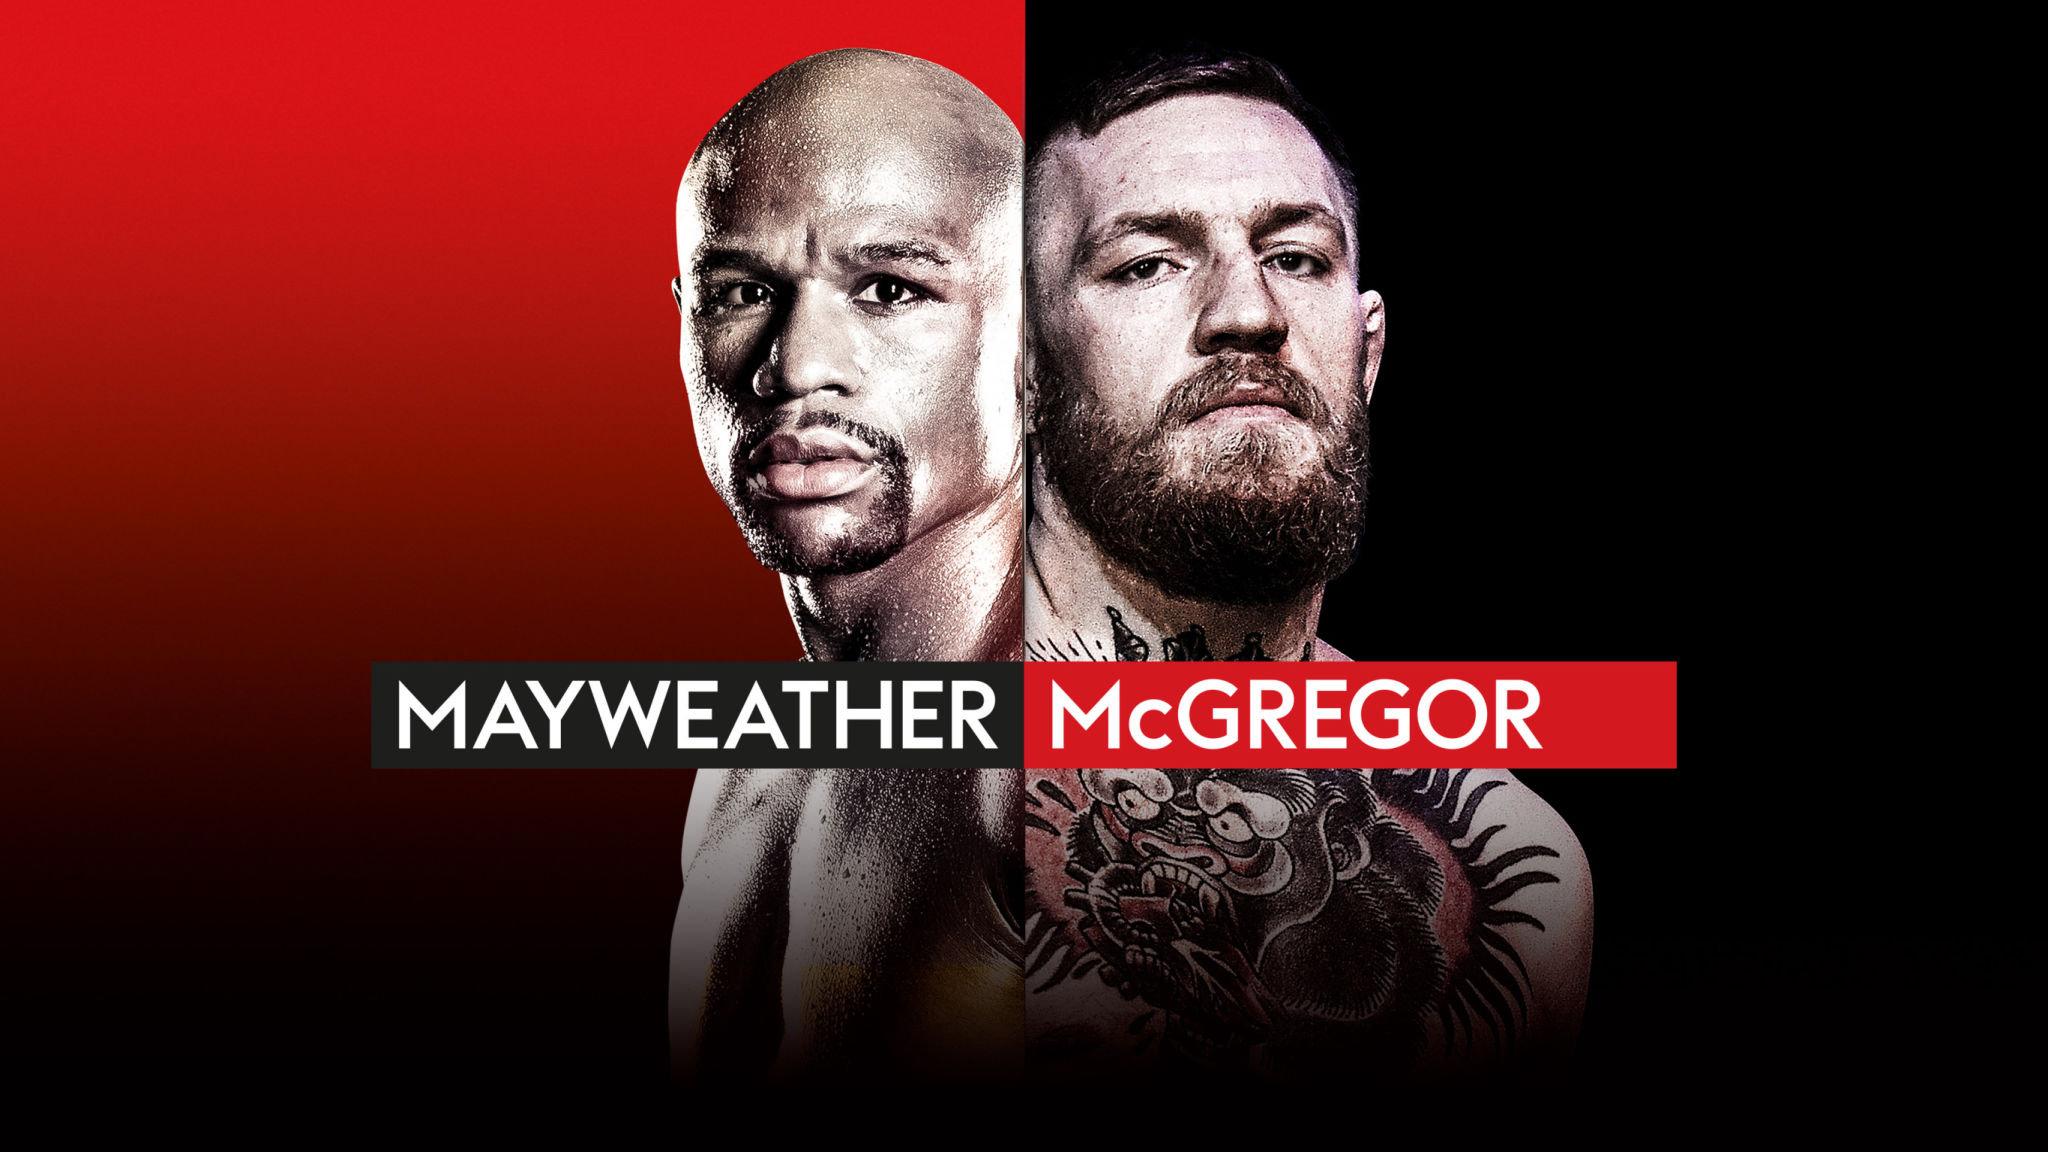 TM Verified Presale Codes For Mayweather Vs McGregor 8/26/2017- LAS VEGAS